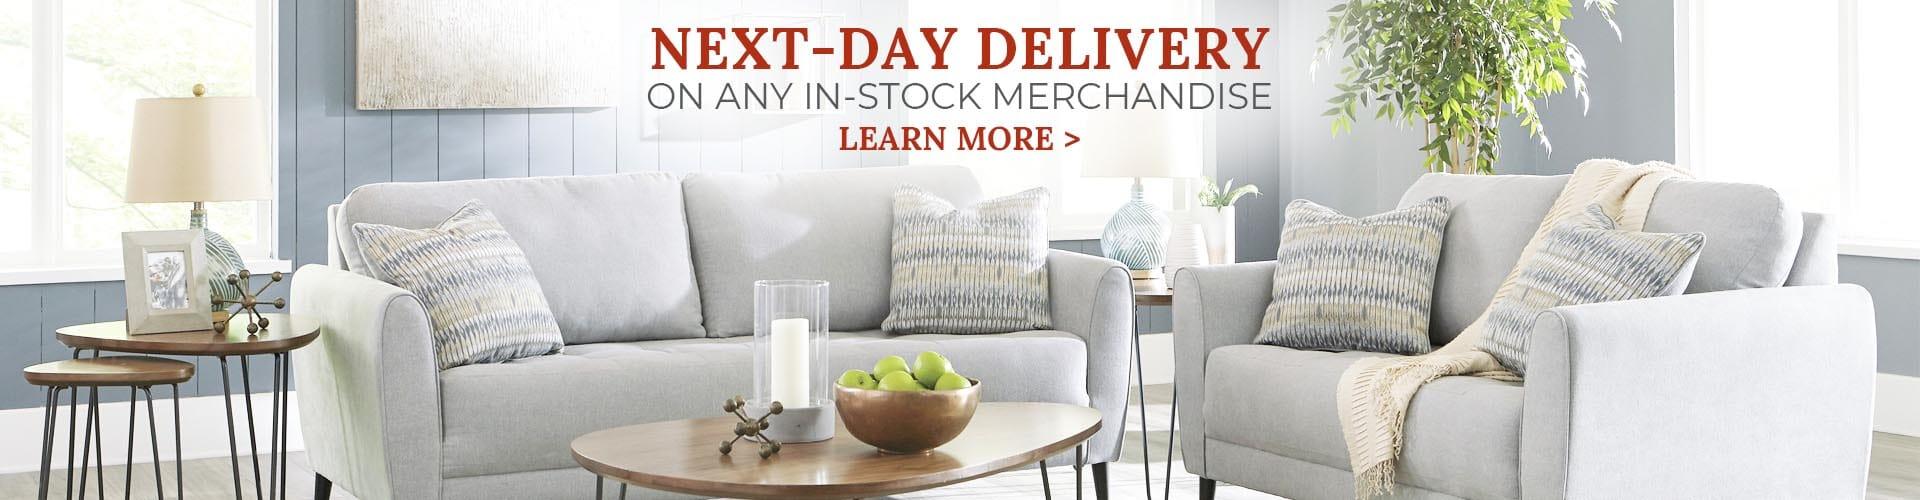 Northeast Wisconsin S 1 Furniture And Mattress Retailer